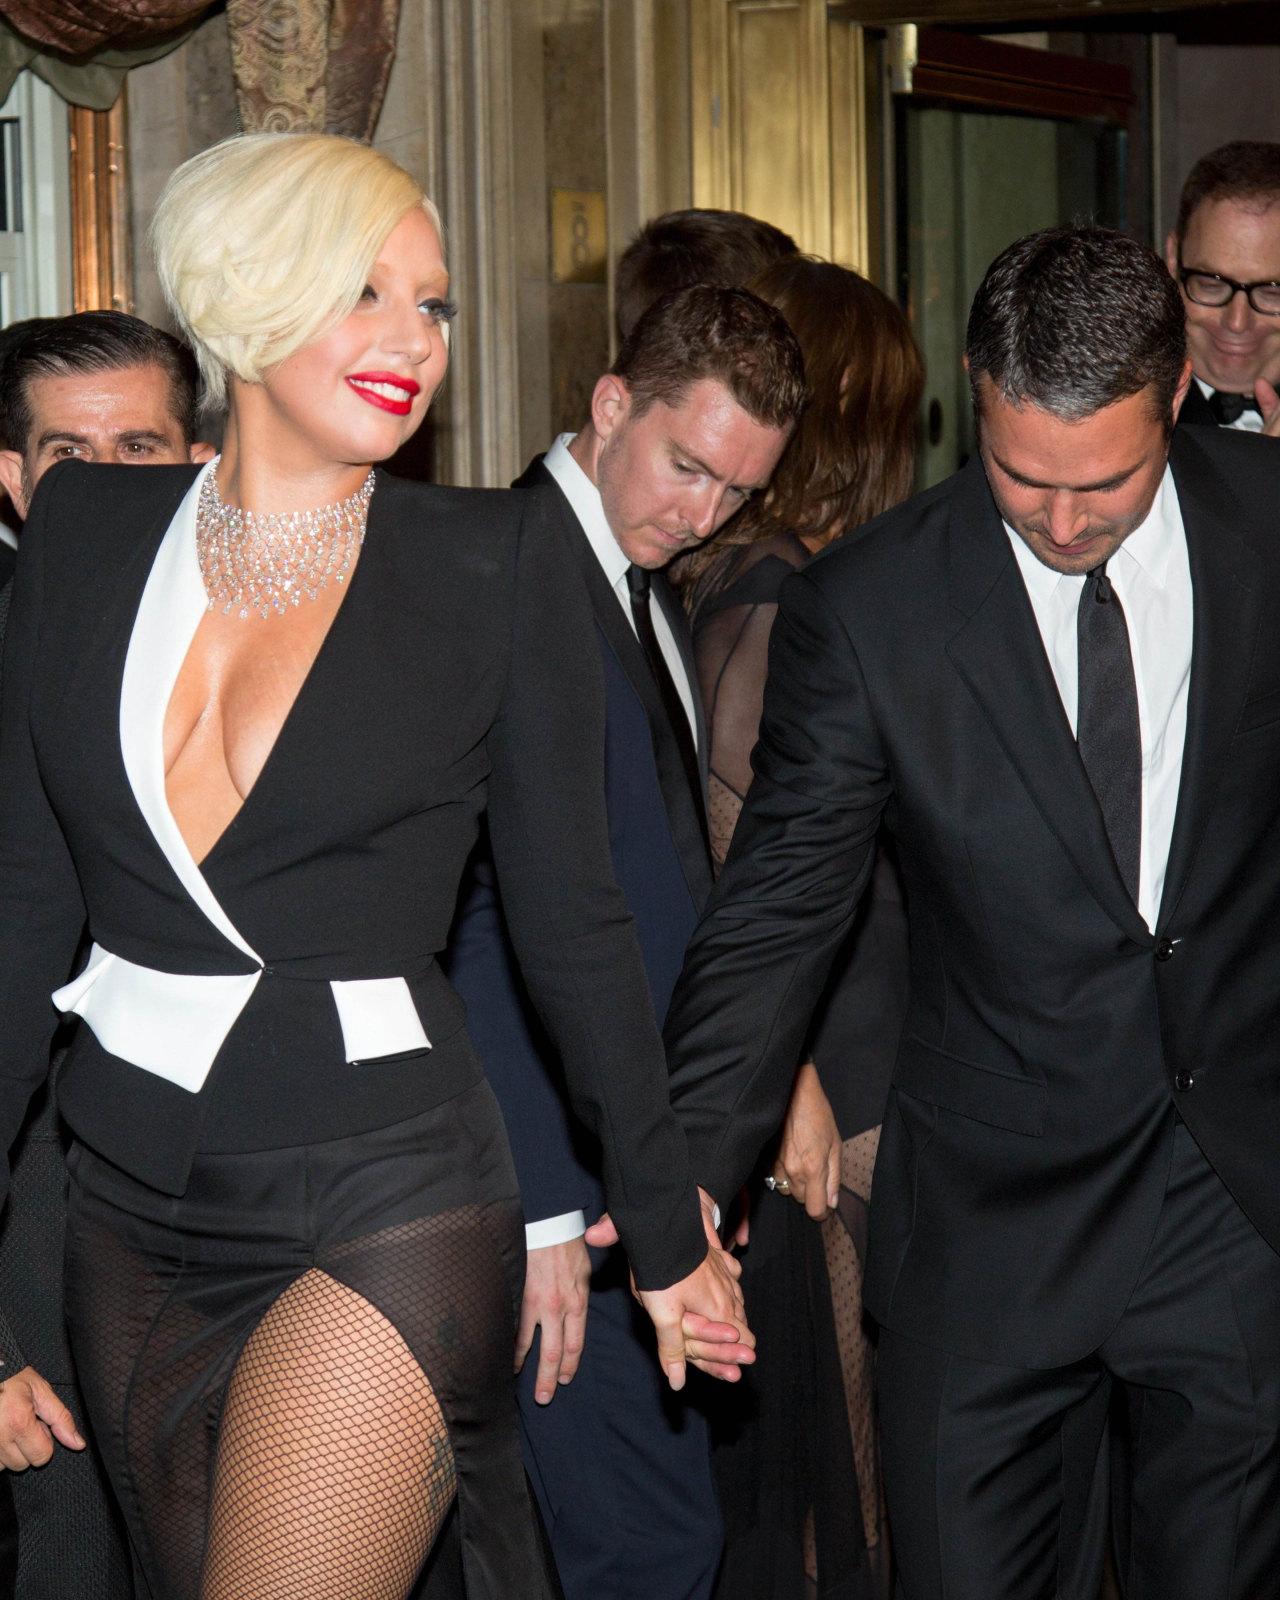 Lady Gaga and Taylor Kinney. - Page 3 Tumblr_nbhl1tOYMQ1rz7rr7o4_1280